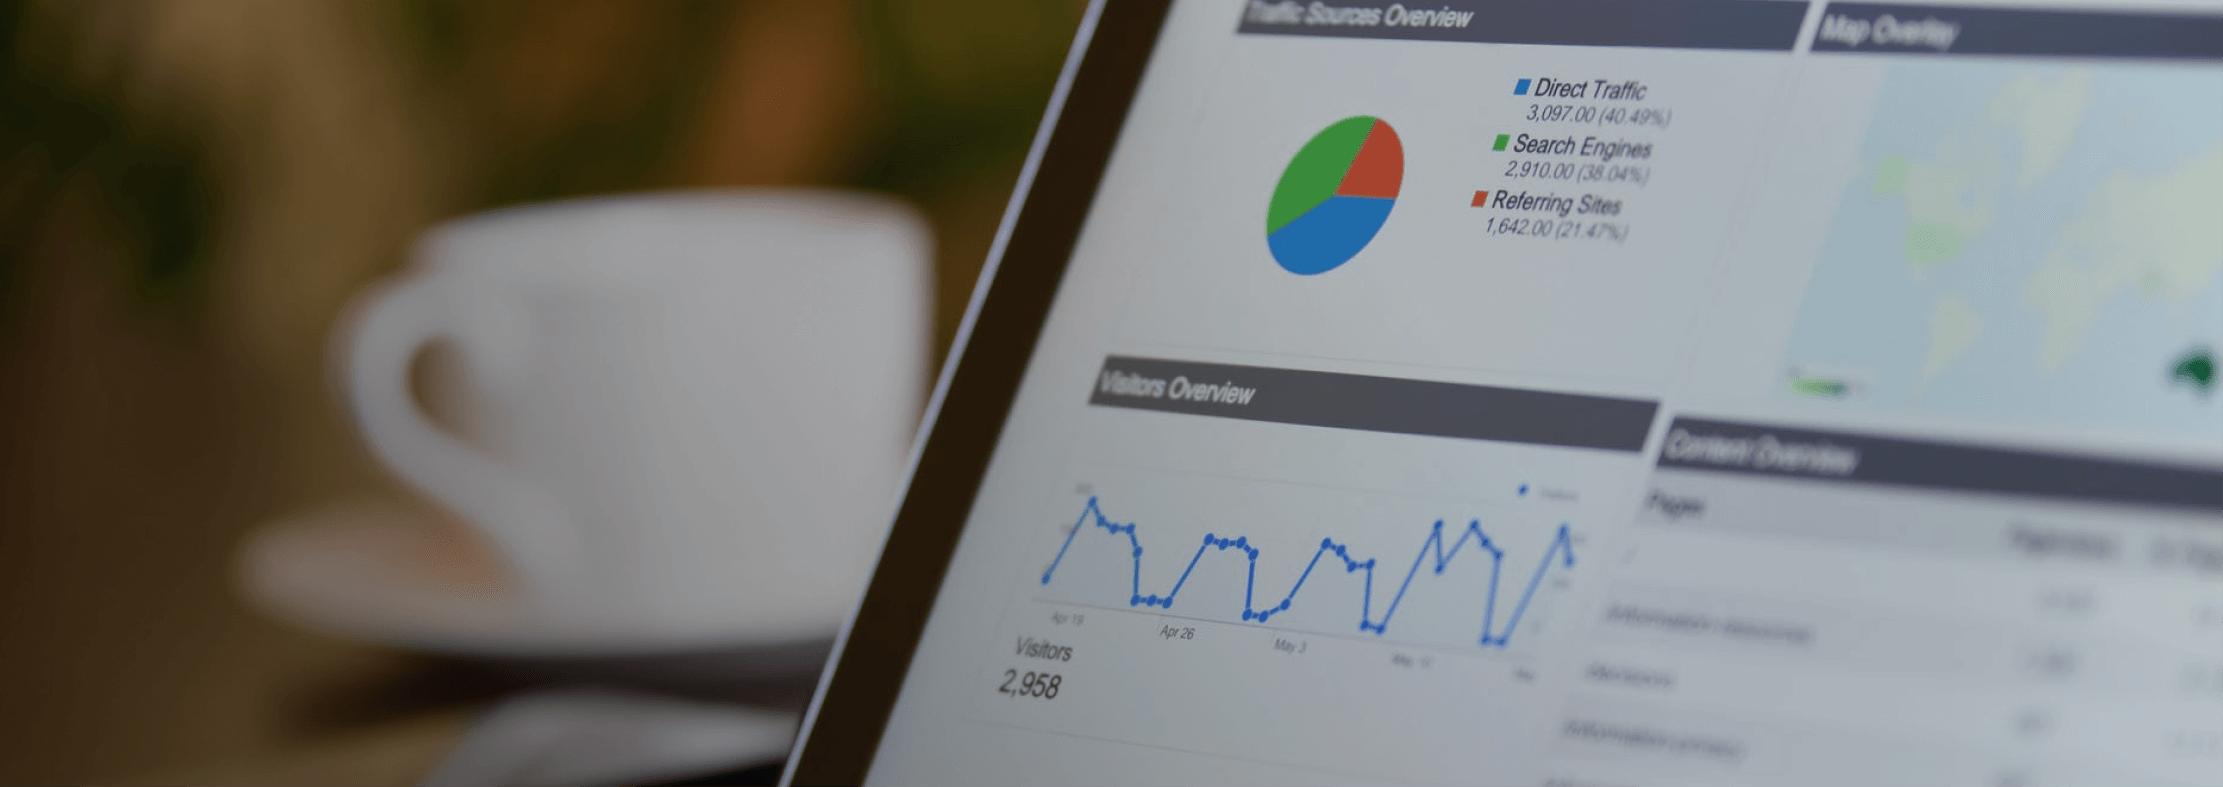 Website traffic analysis